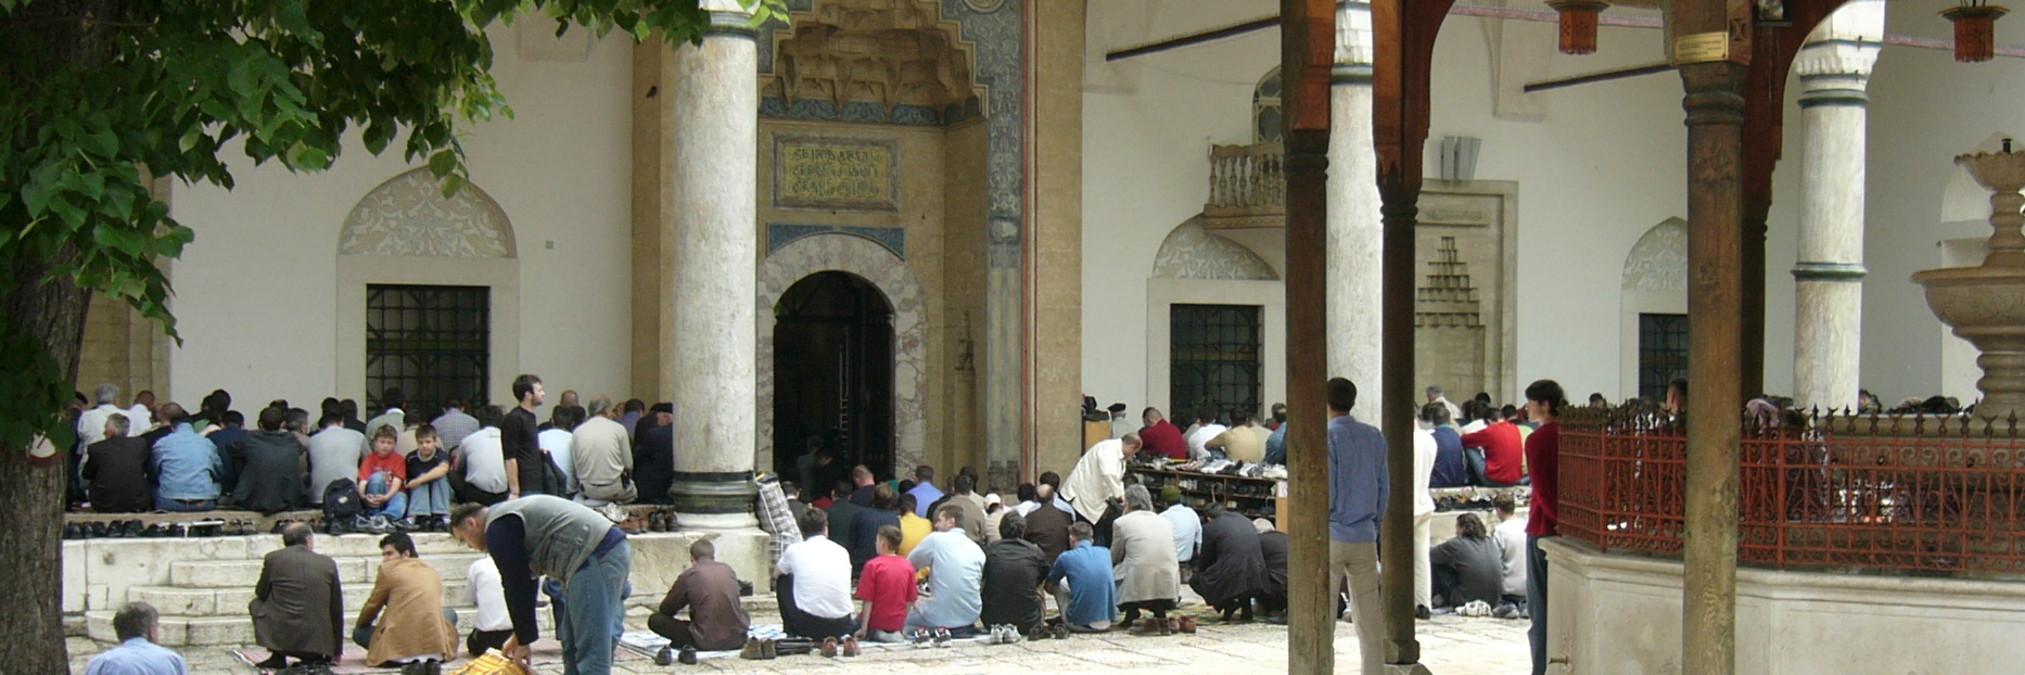 Мусульмане во дворе Беговой мечети в Сараево. Elias Bizannes, CC BY-SA 2.0